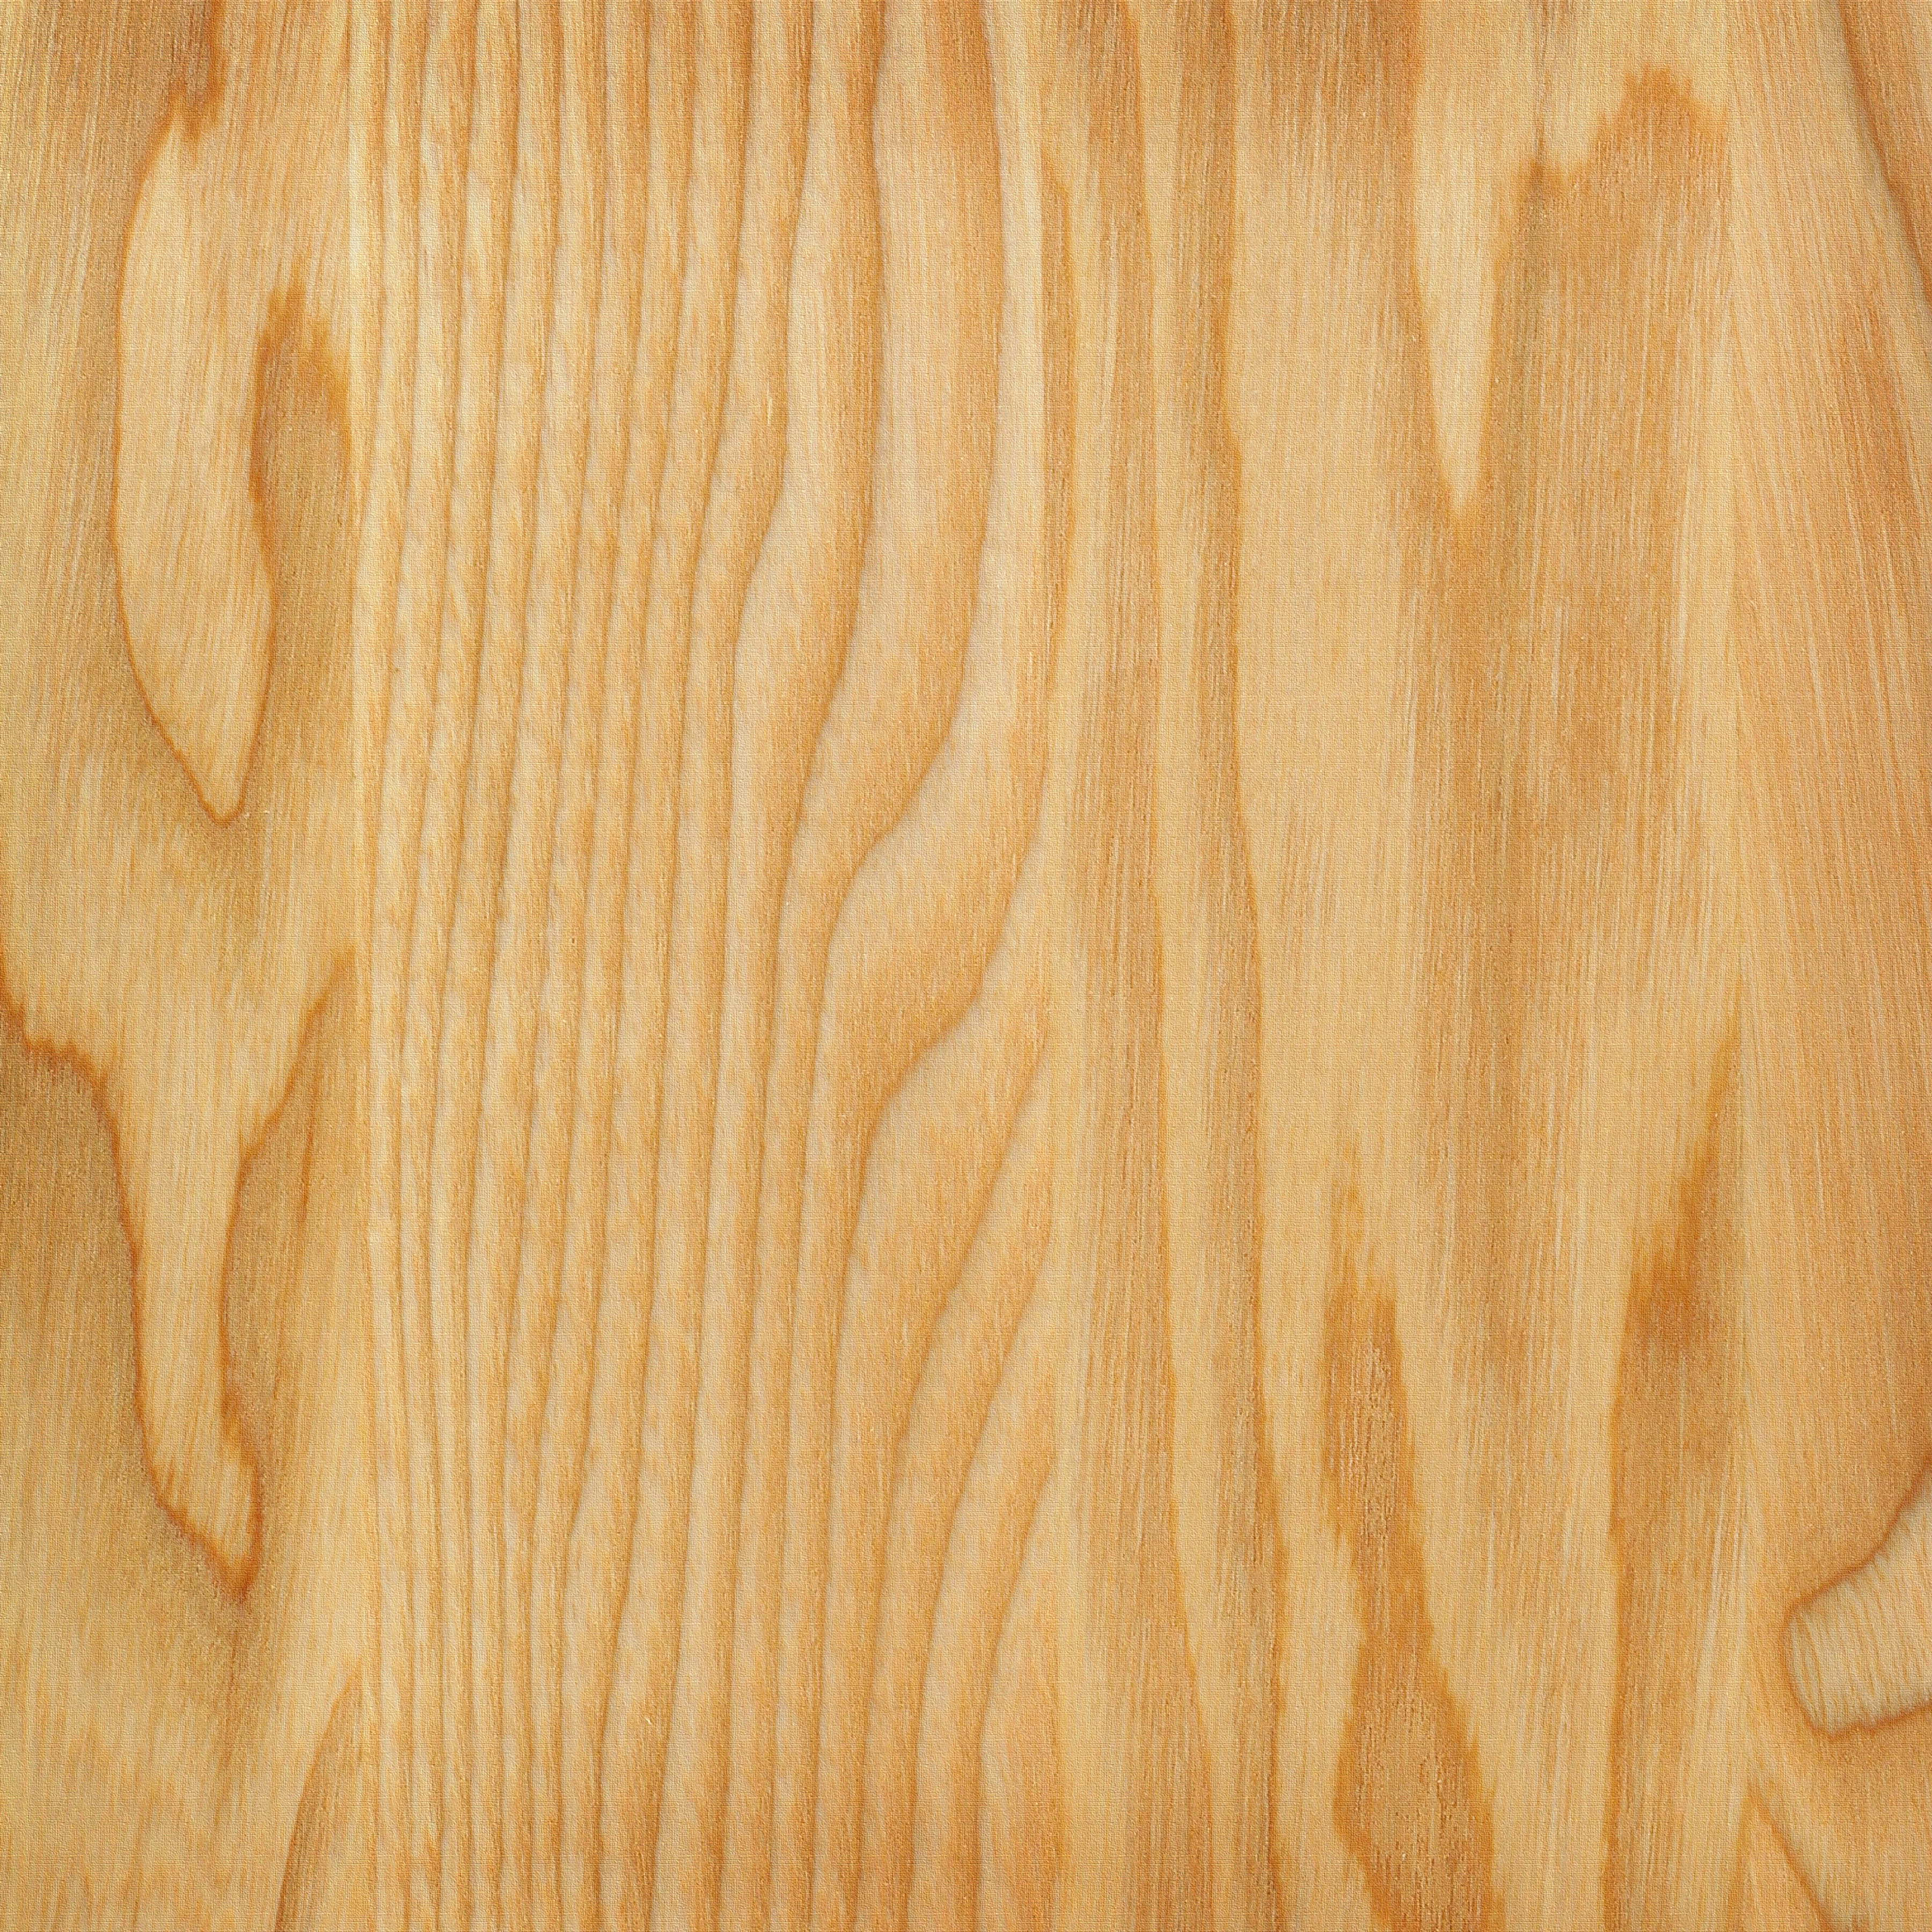 wood wallpaper 6 3600x3600